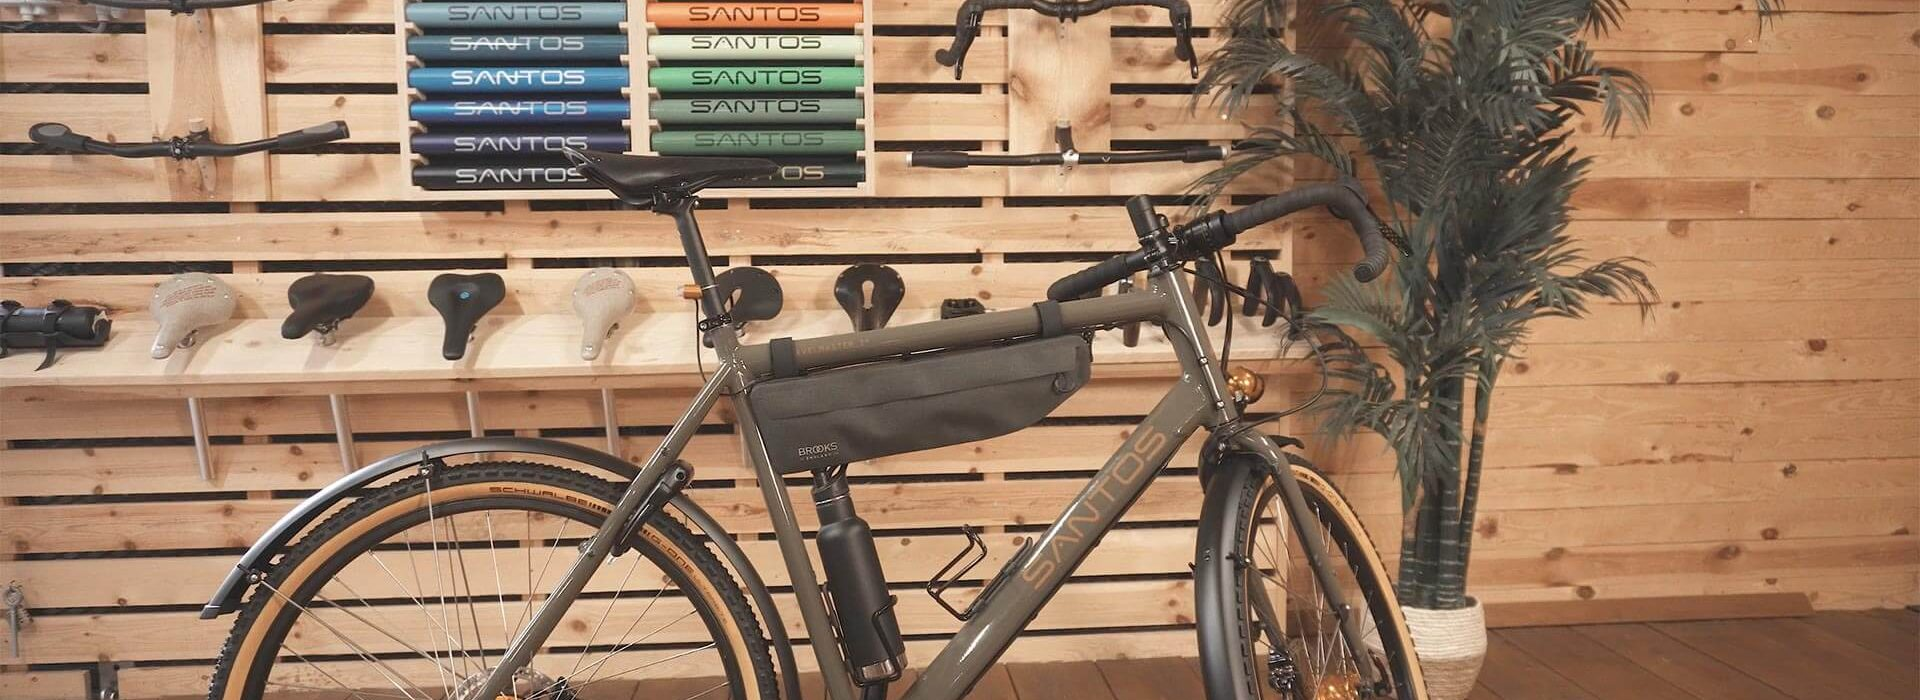 Santos bike styling